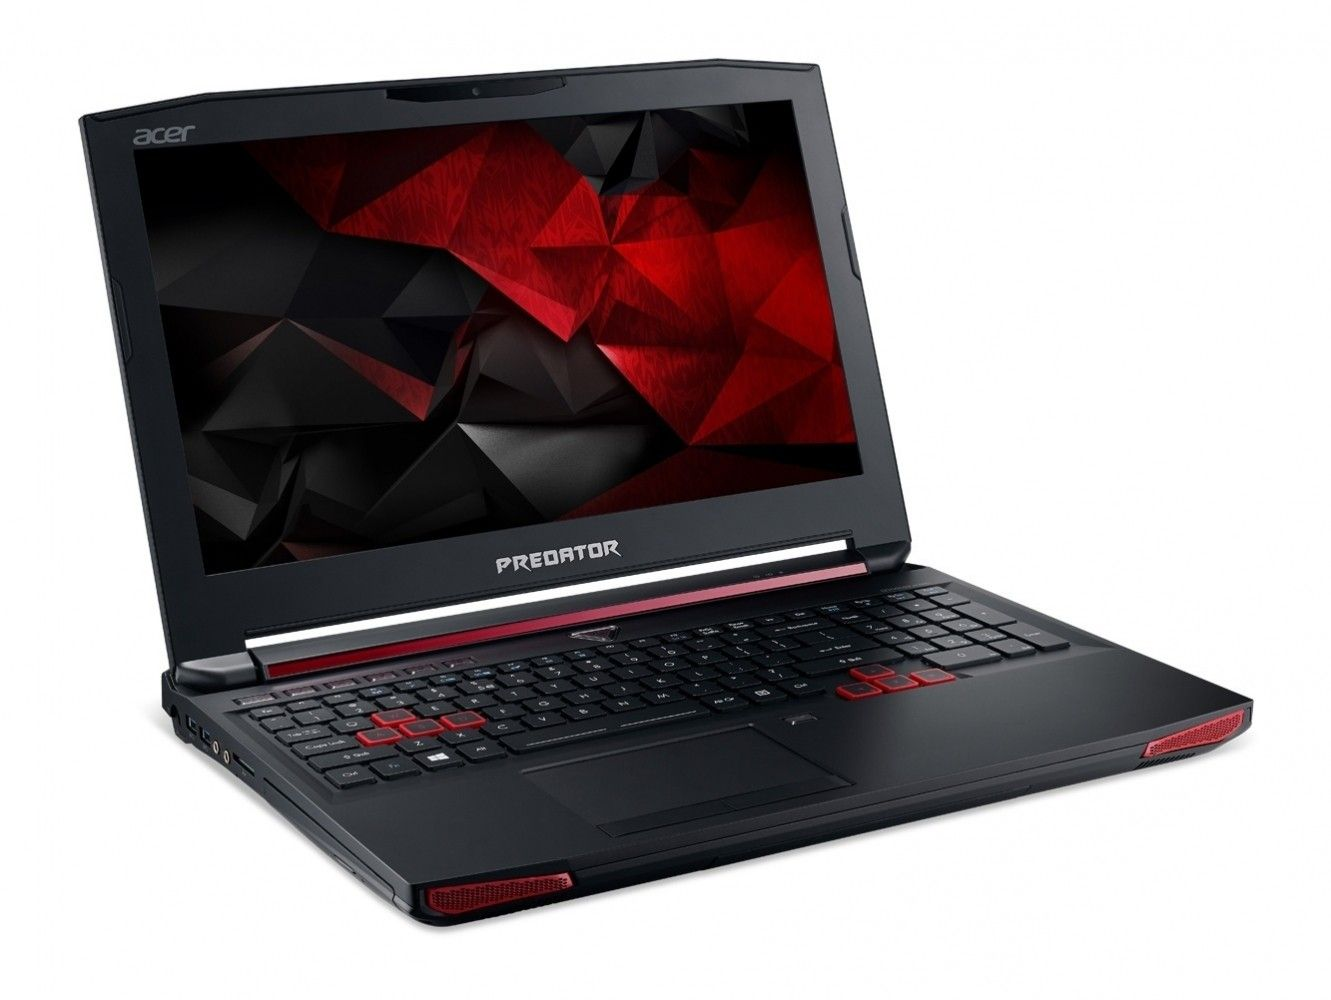 Ноутбук Acer Predator 15 G9-591-52PQ (NX.Q07EU.008) - 1